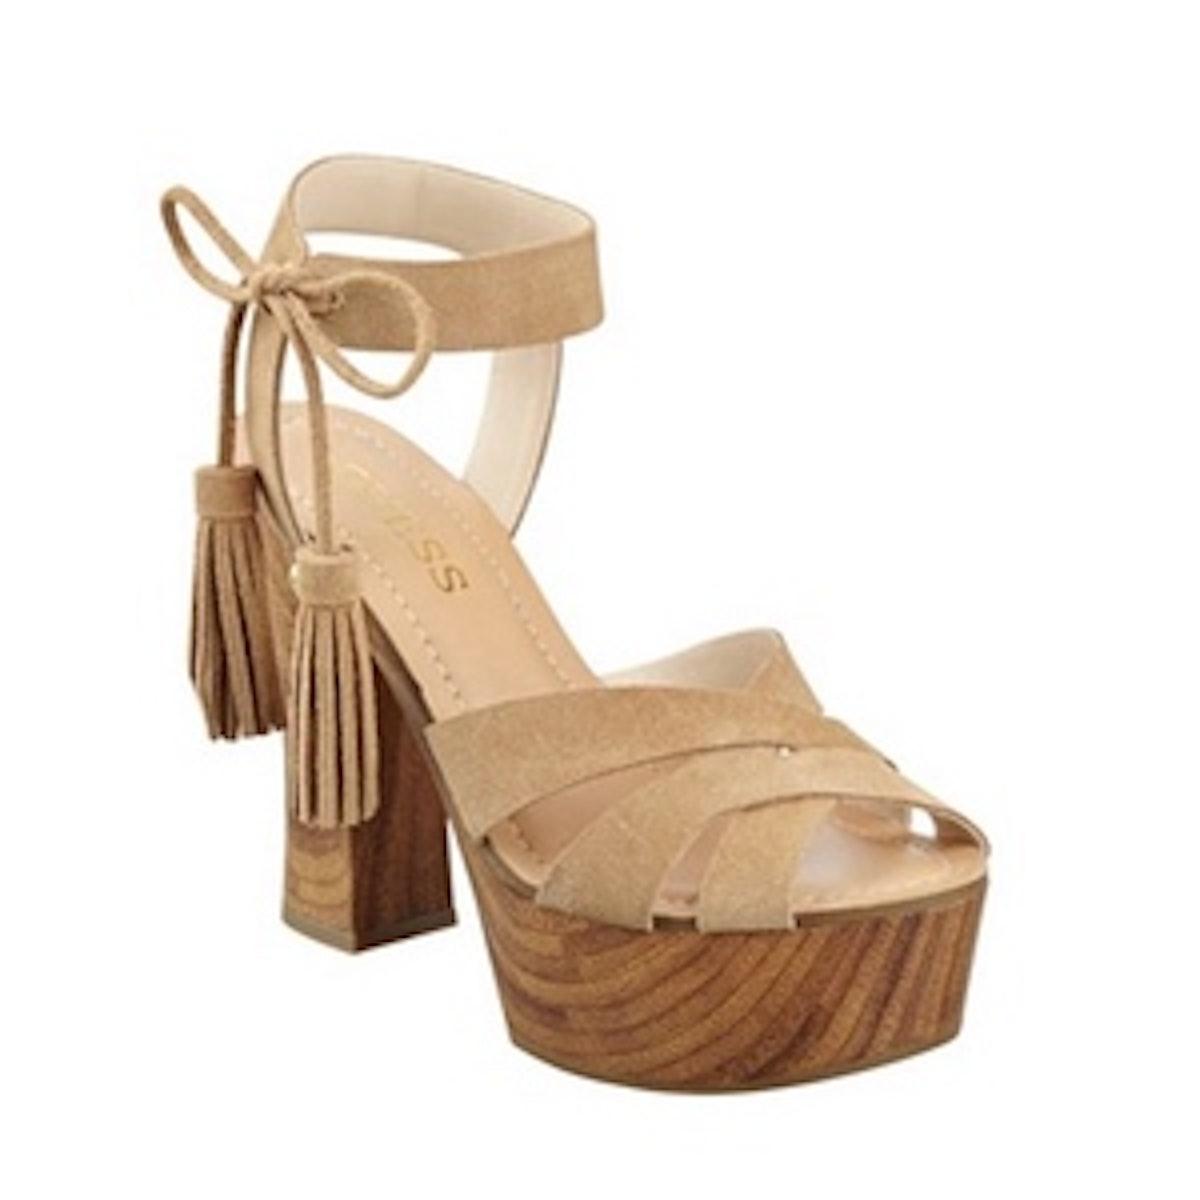 Prenna Platform Heels